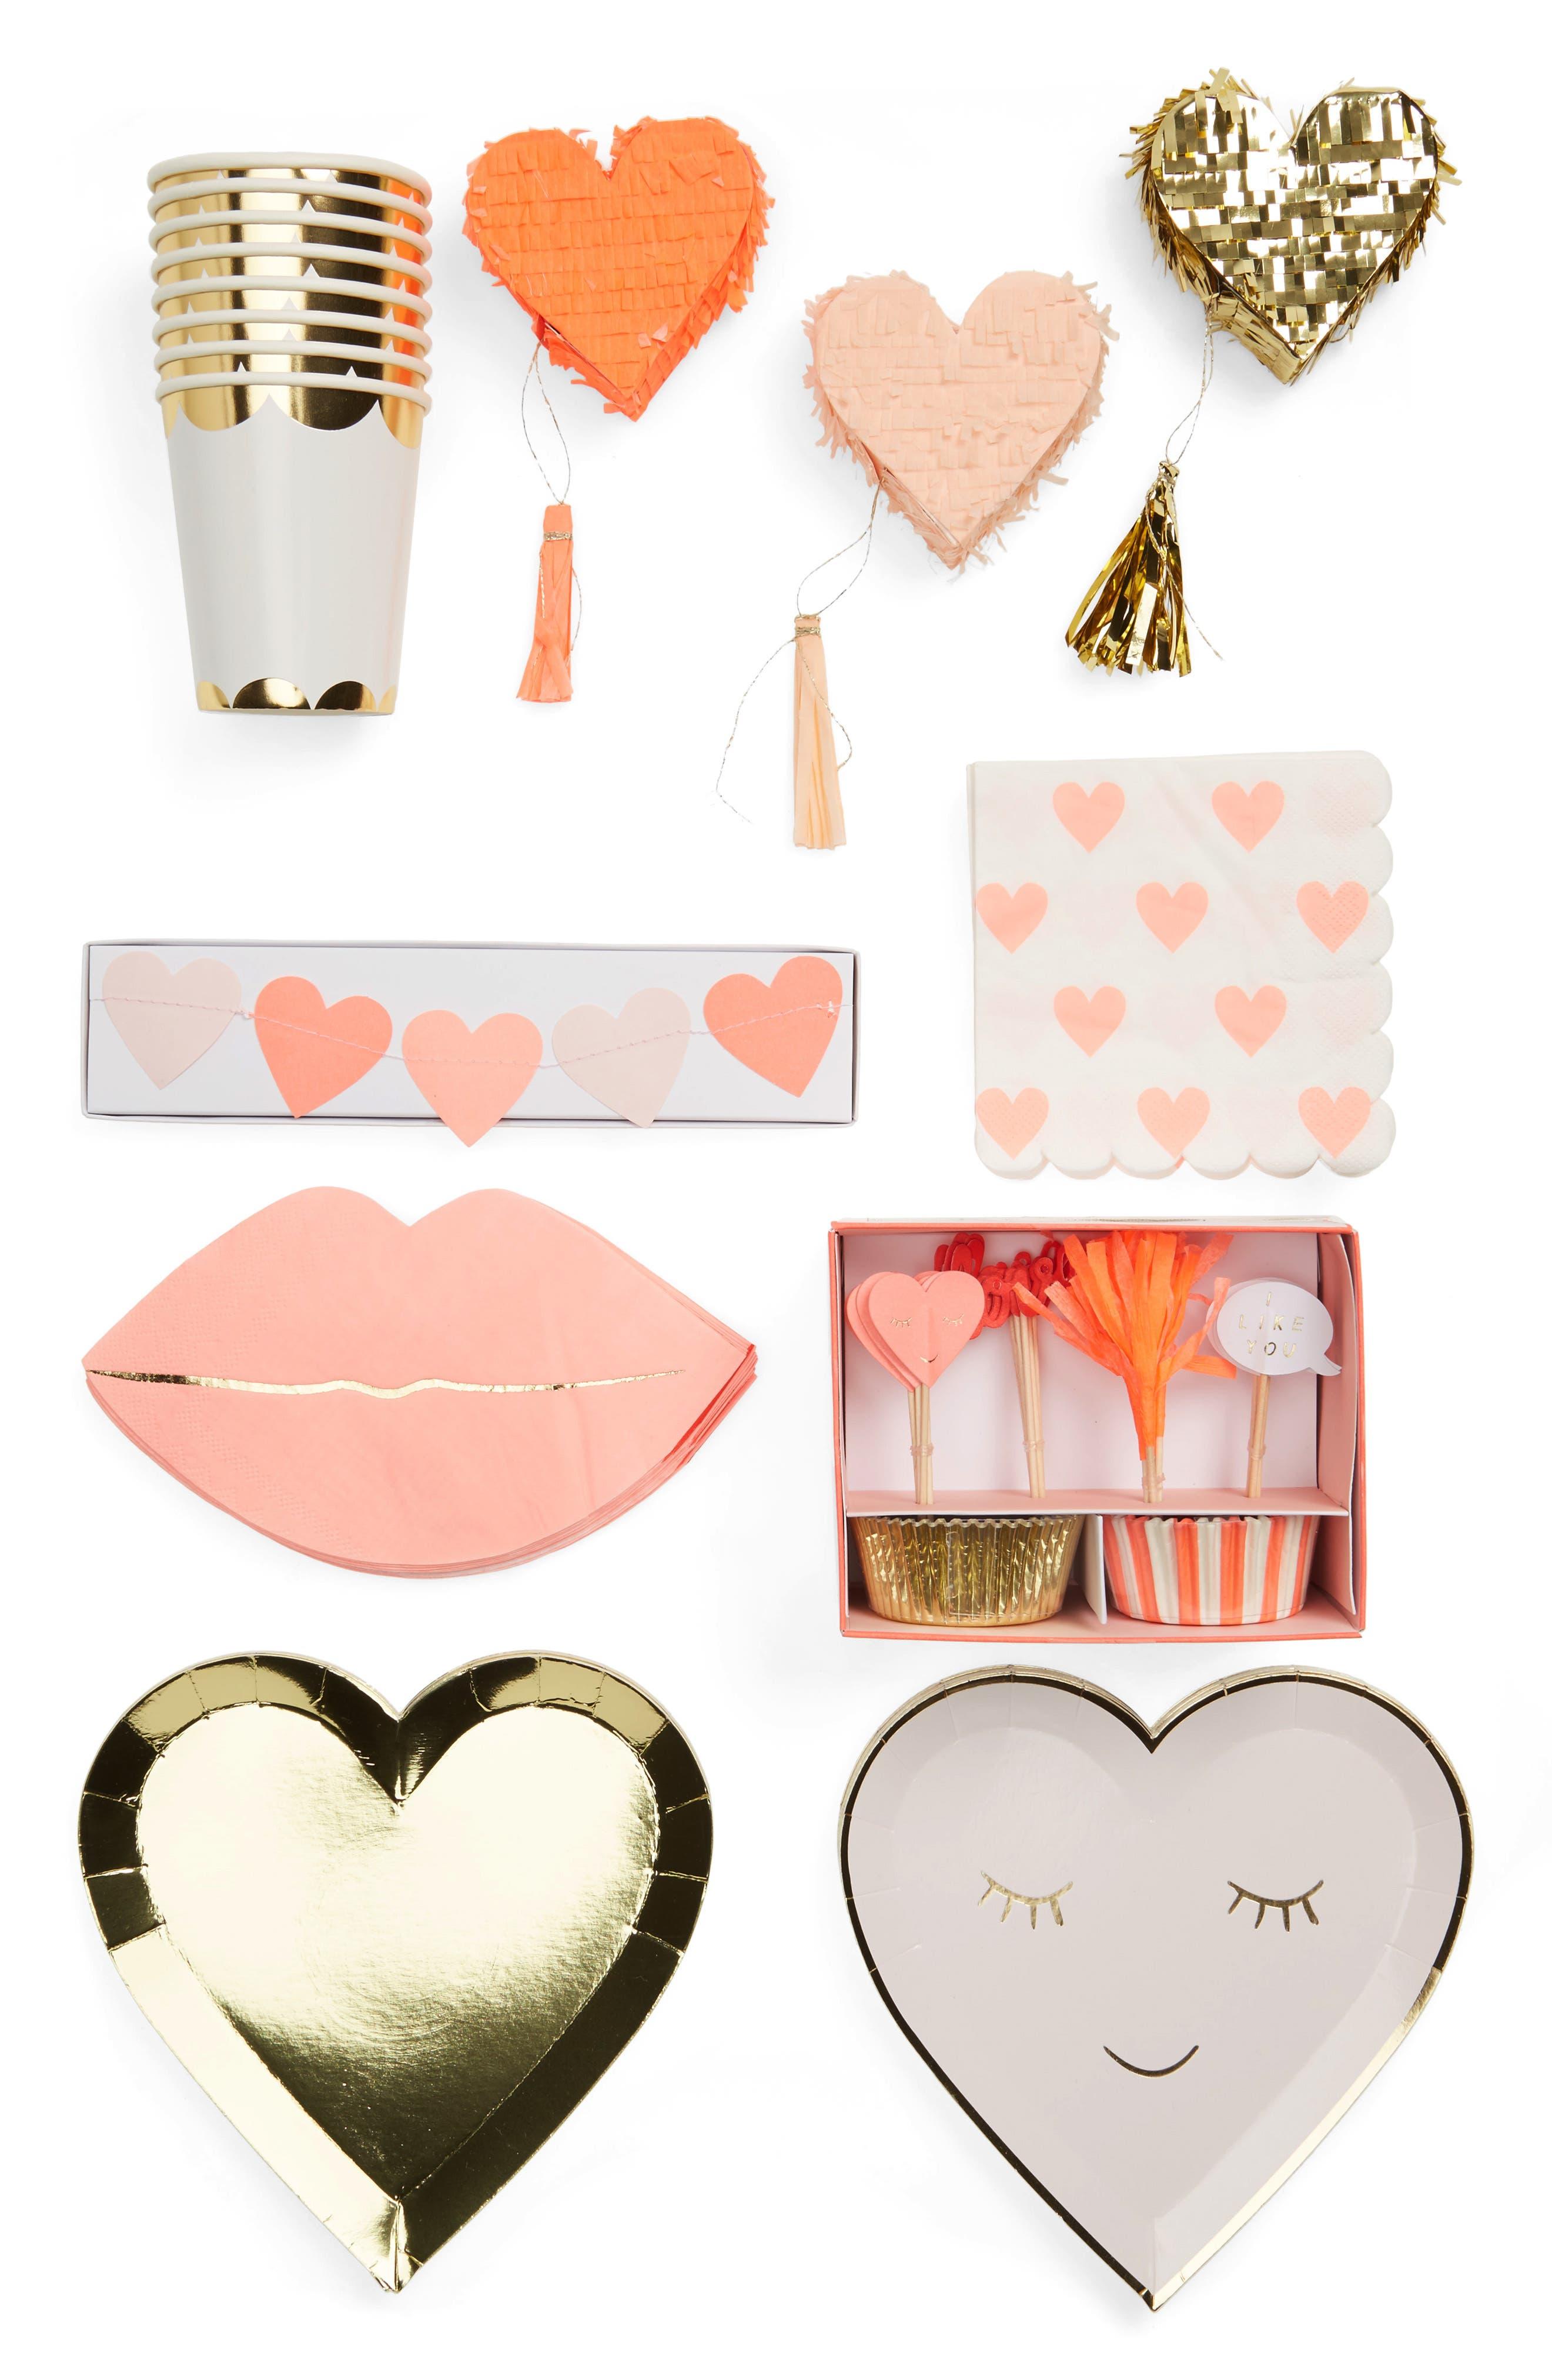 Main Image - Meri Meri Valentine's Day Party Bundle